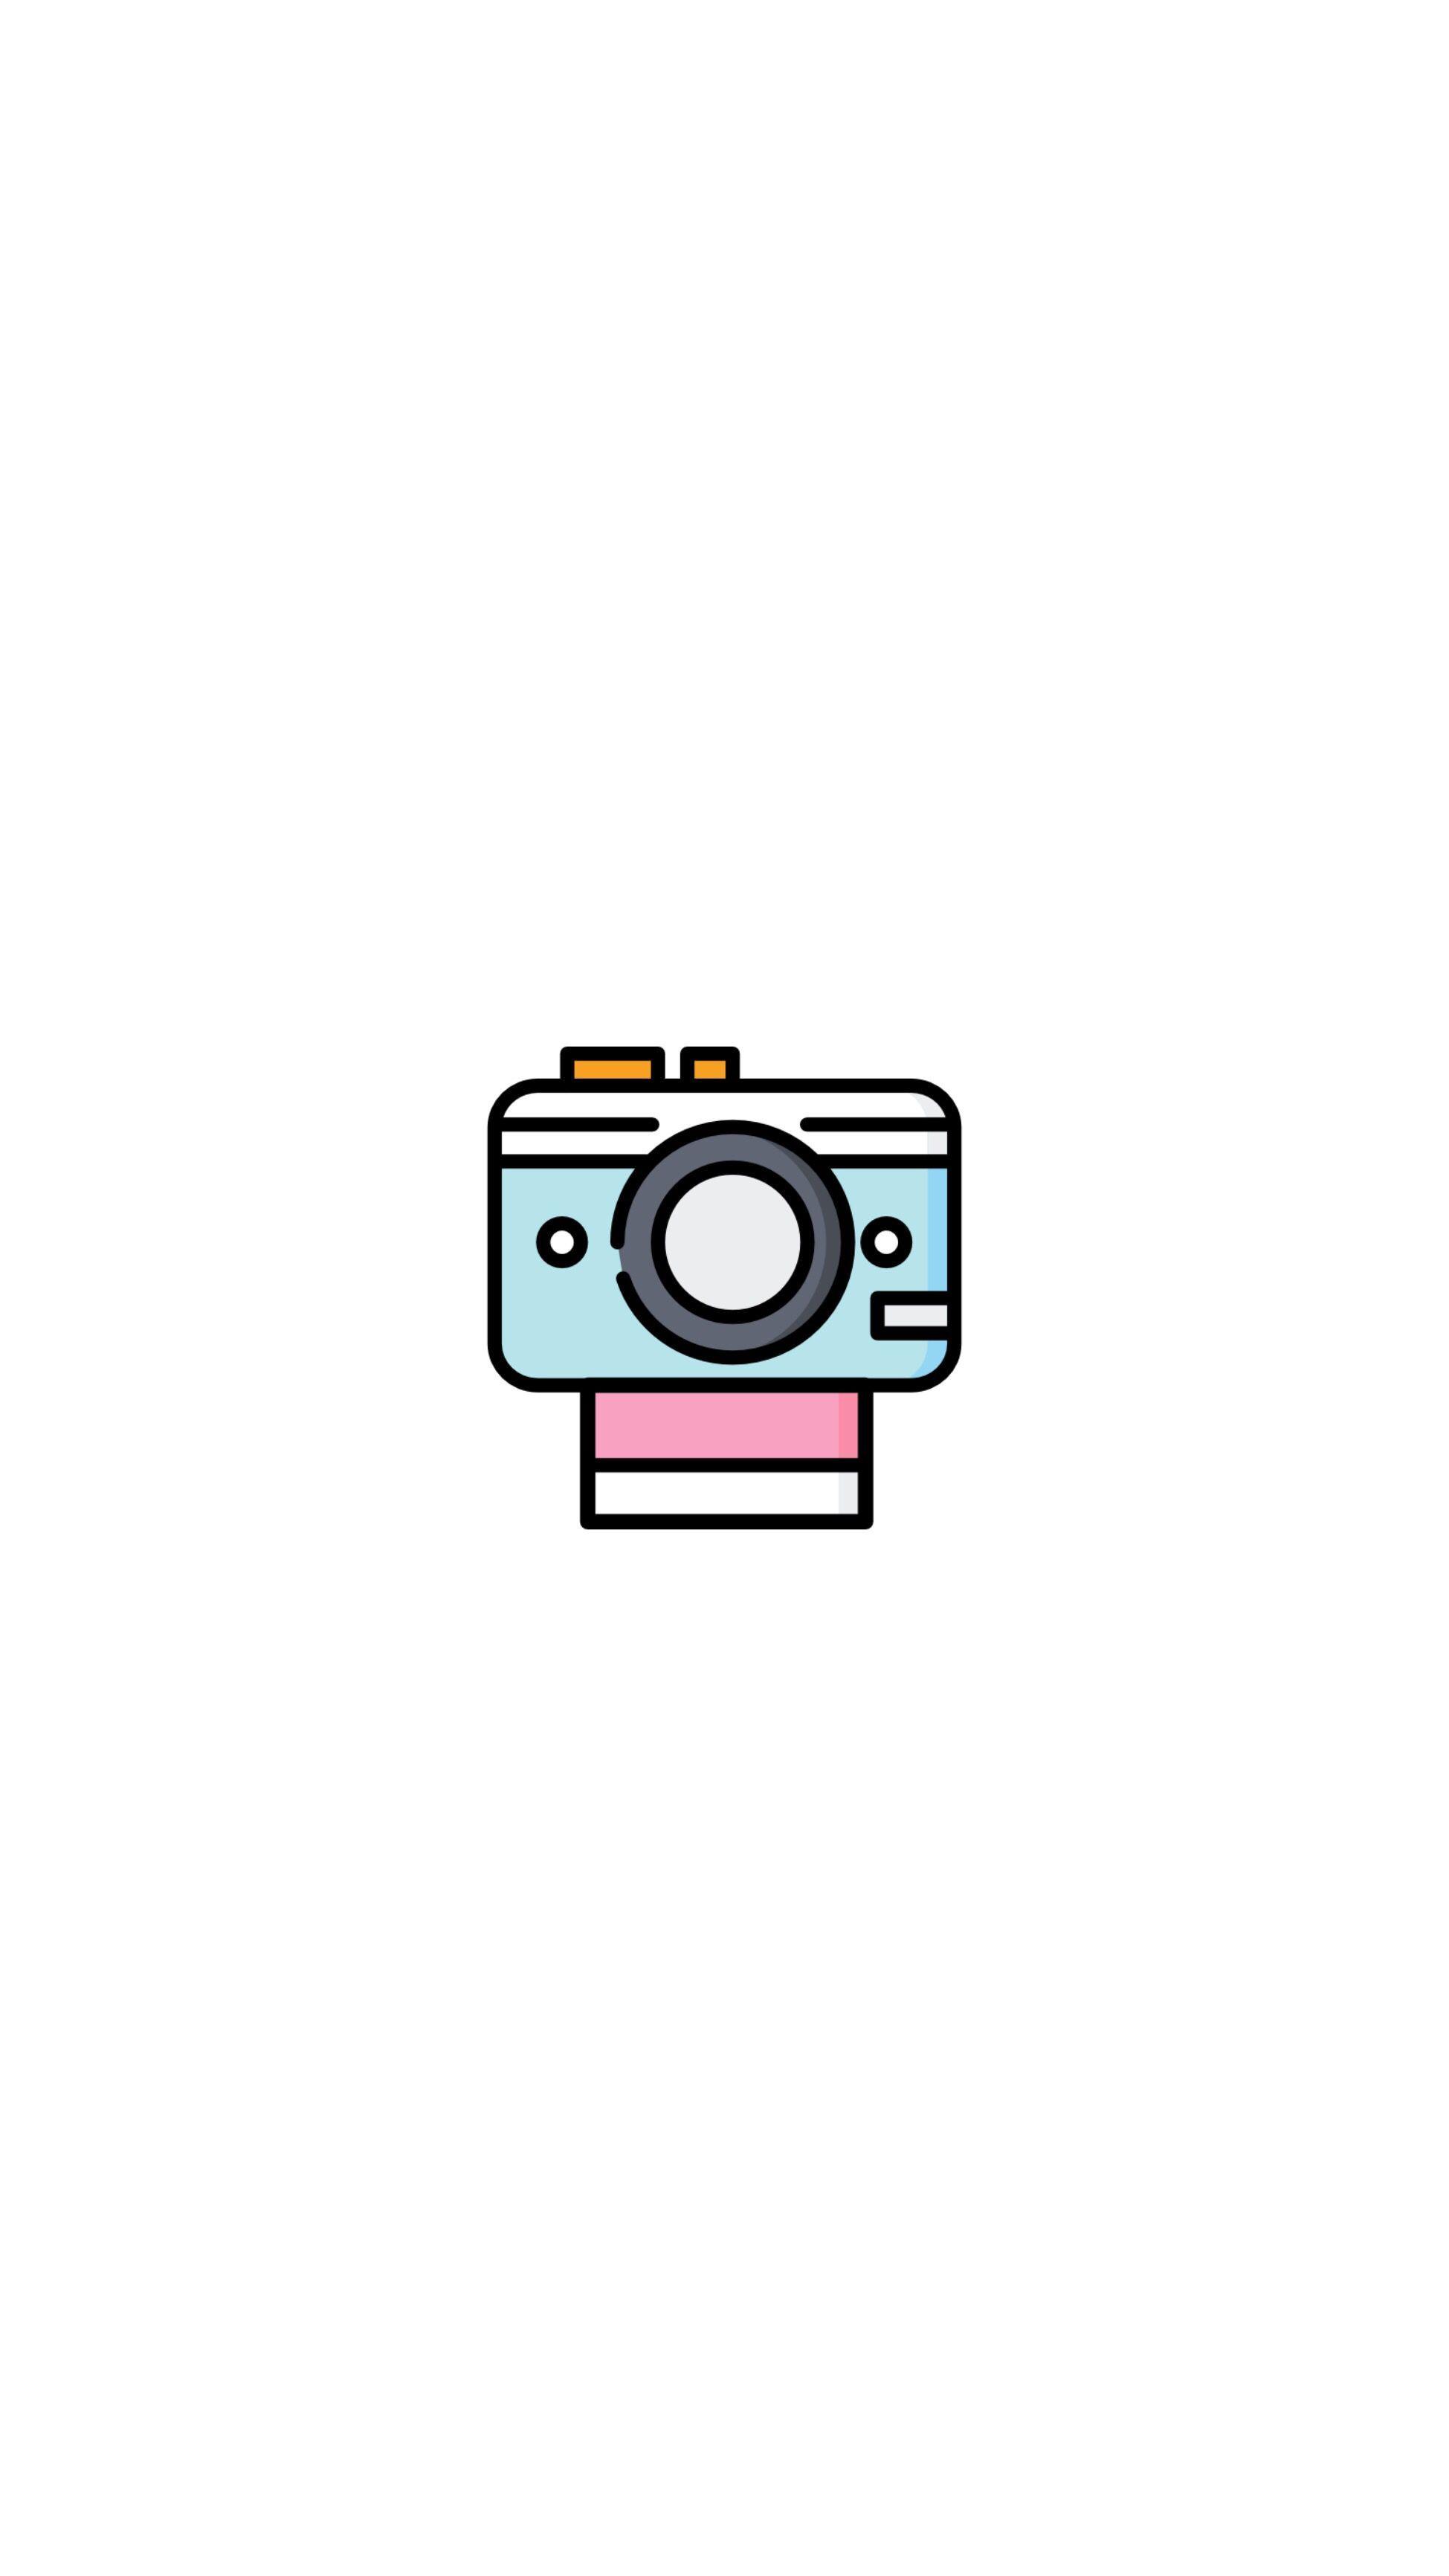 Icy Camera Dslr Link Dslrphotographer Photographygearaccessories Instagram Logo Instagram Icons Instagram Wallpaper